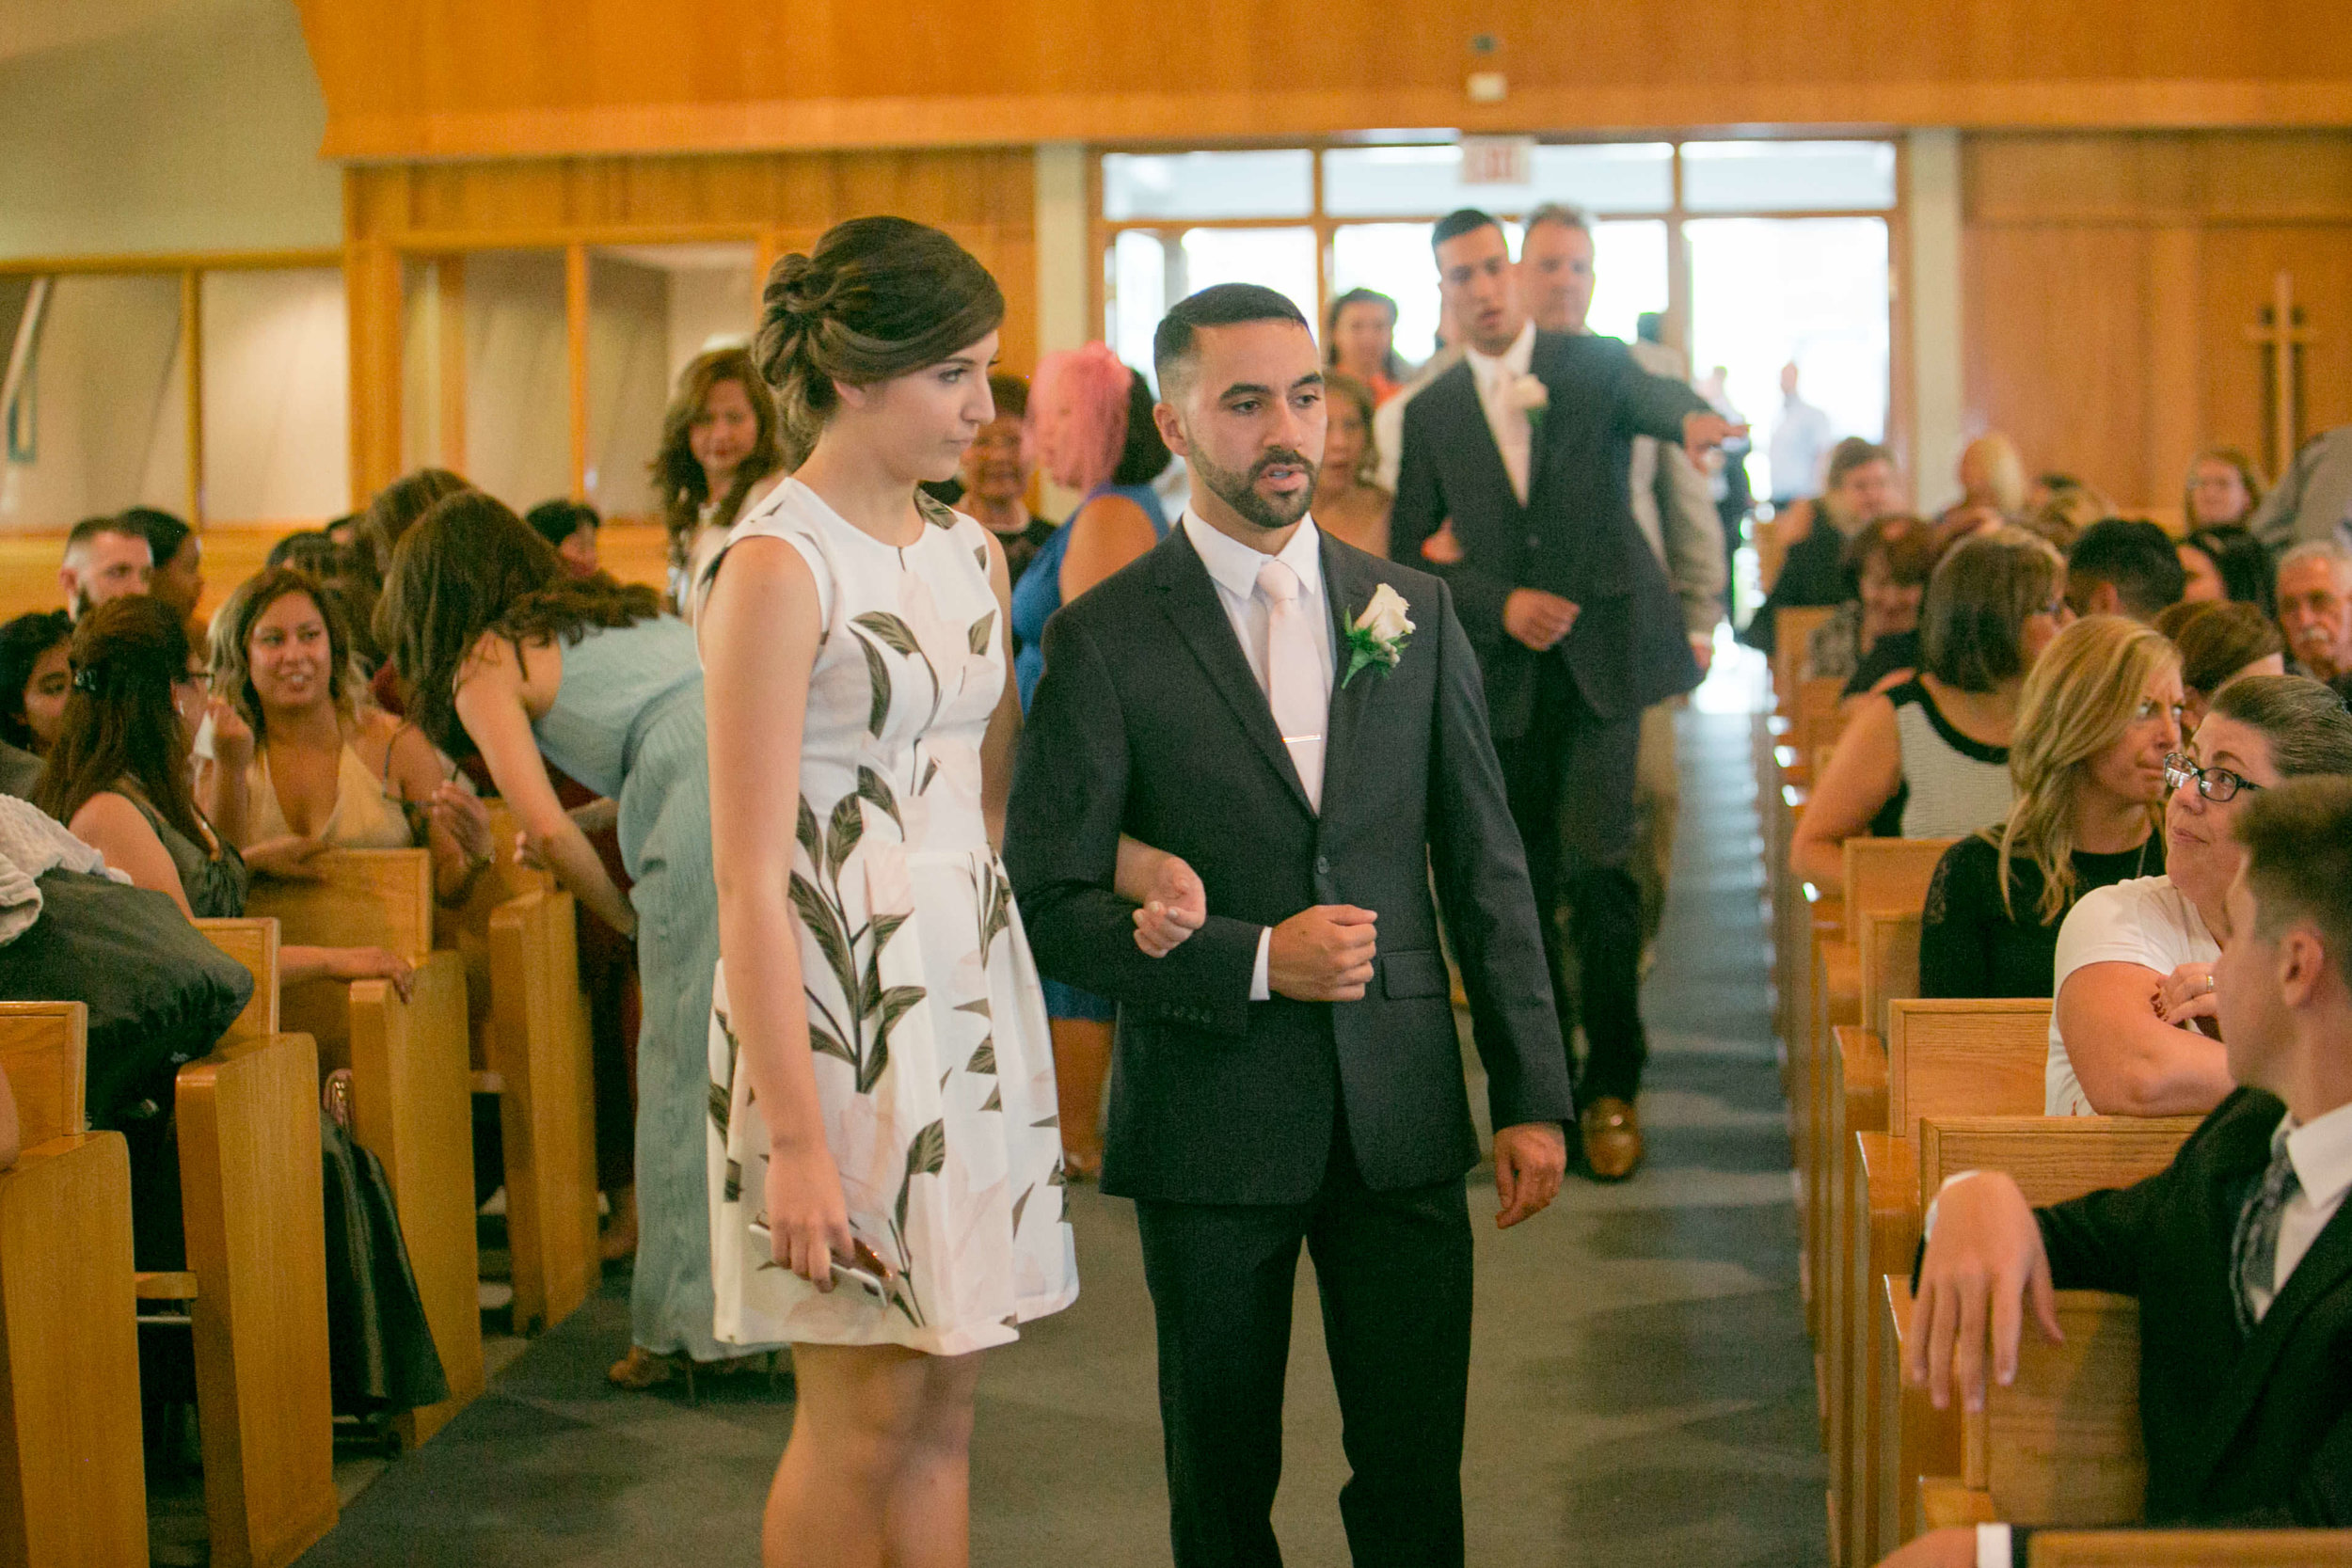 Stefanie___Bernard___Daniel_Ricci_Weddings_High_Res._Finals__181.jpg